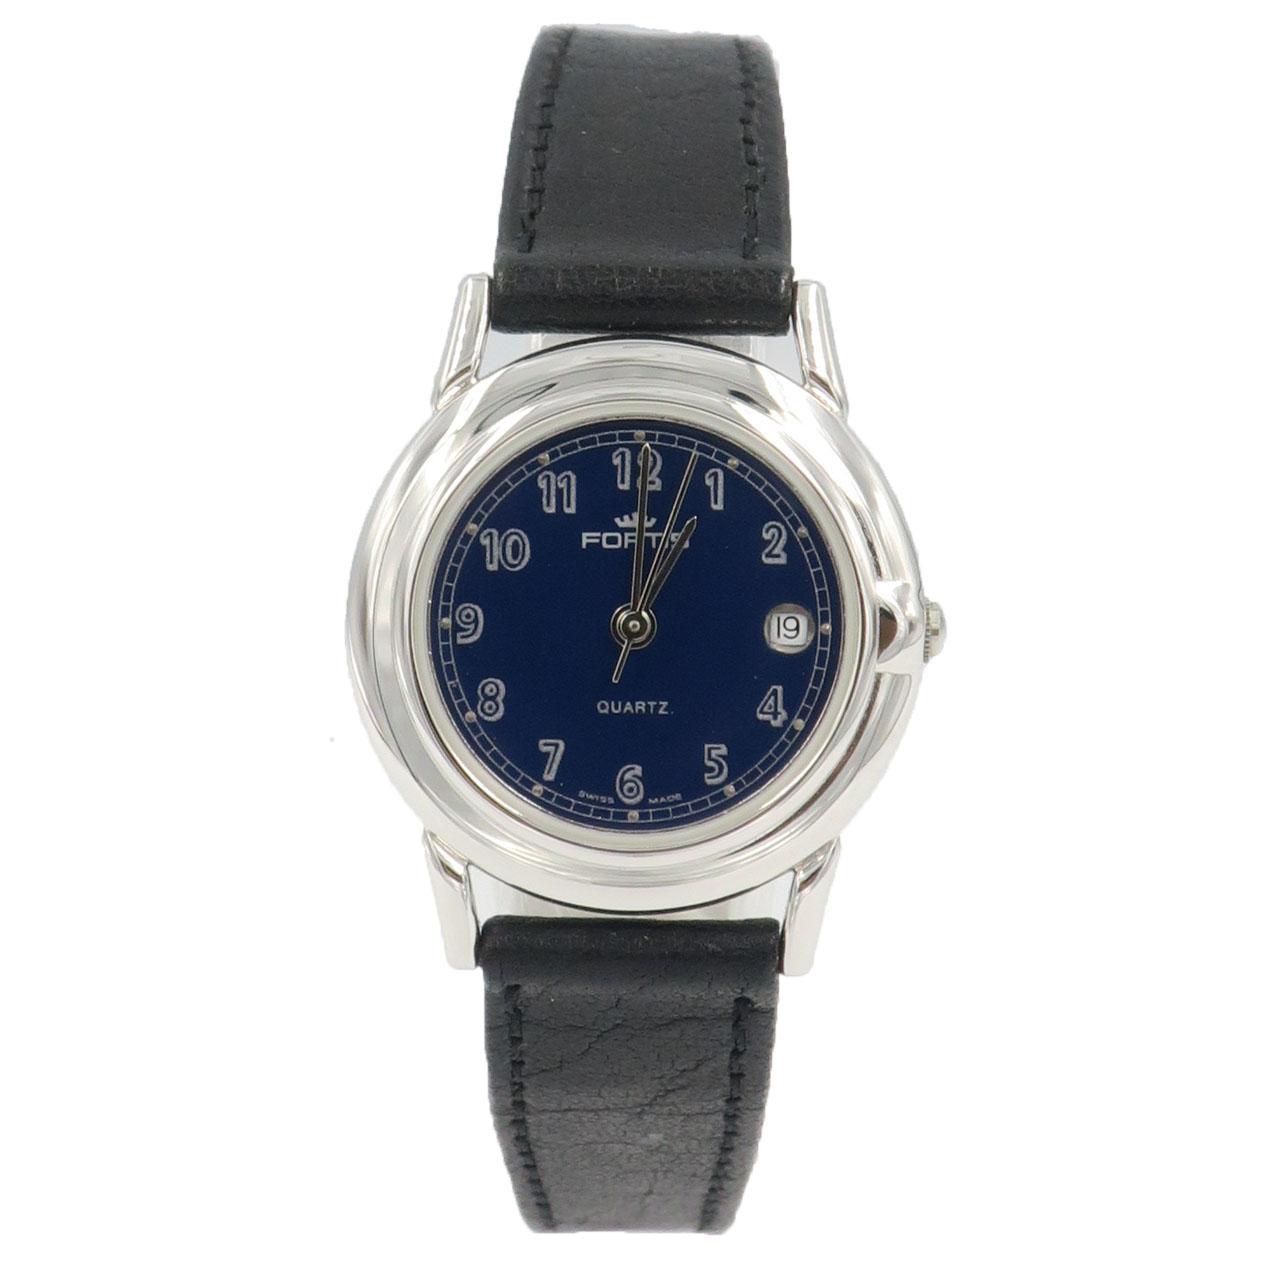 ساعت زنانه برند فورتیس مدل F 5493.23.36